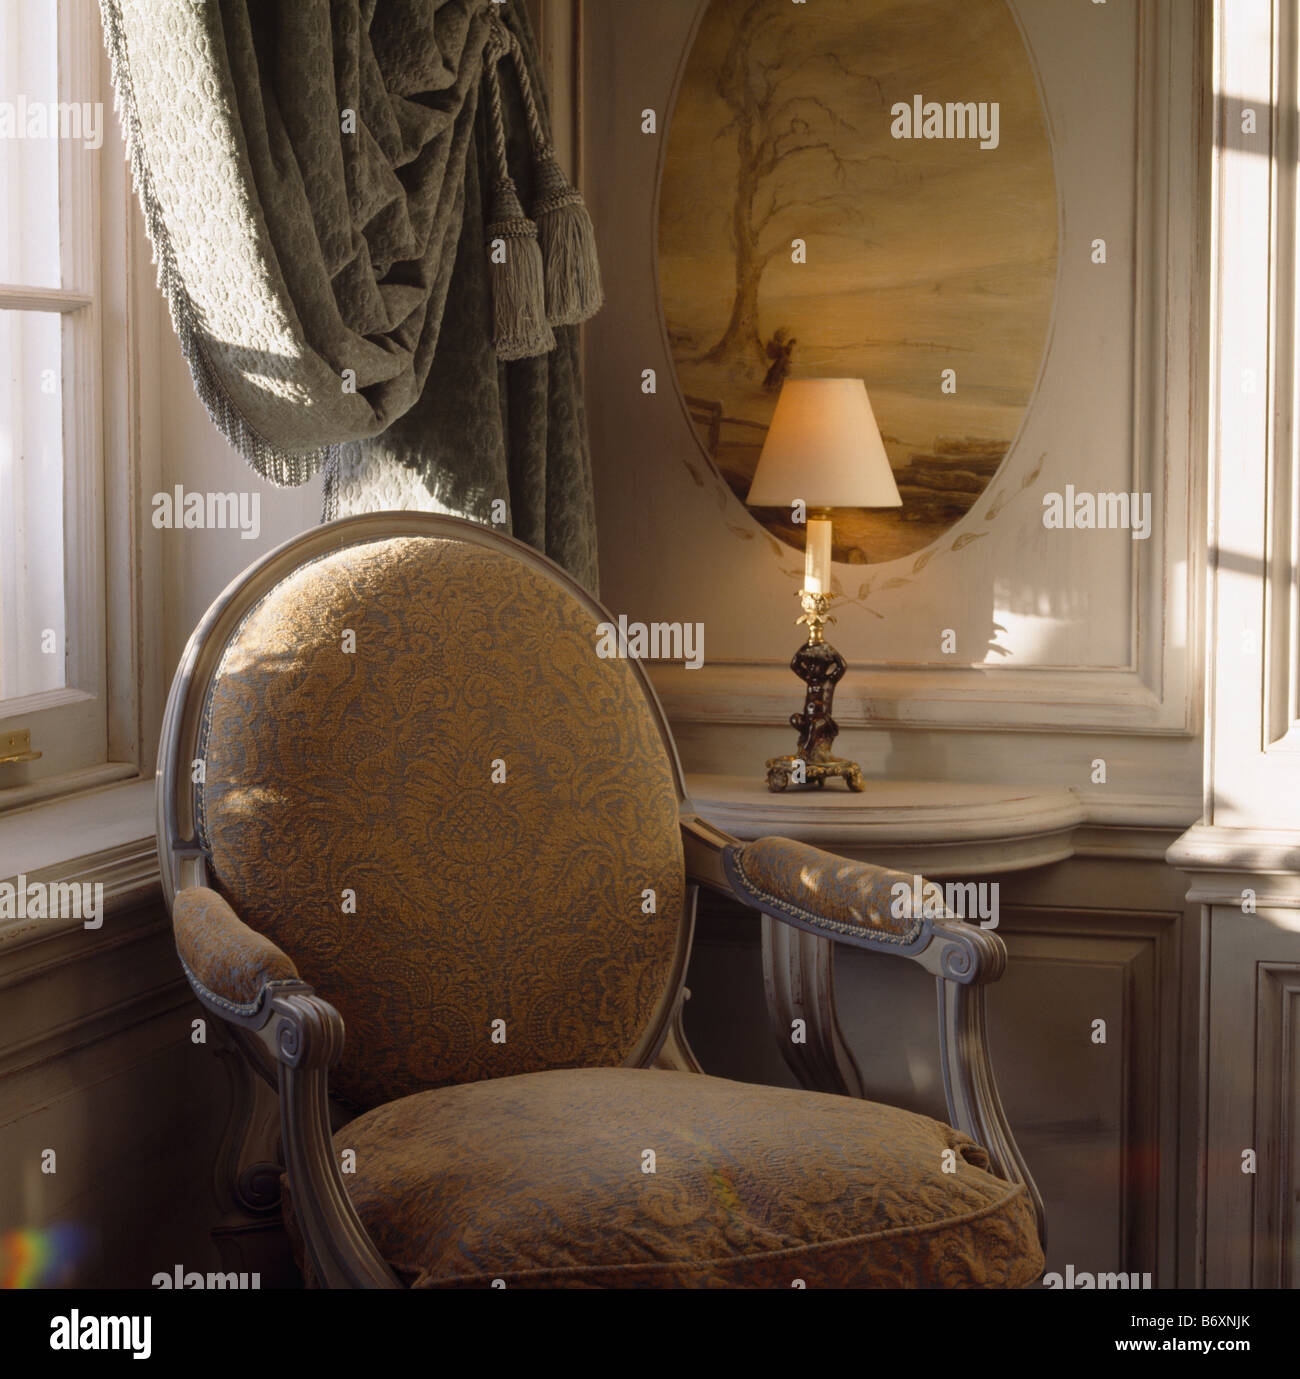 interiors sittingroom drapes armchair stockfotos interiors sittingroom drapes armchair bilder. Black Bedroom Furniture Sets. Home Design Ideas